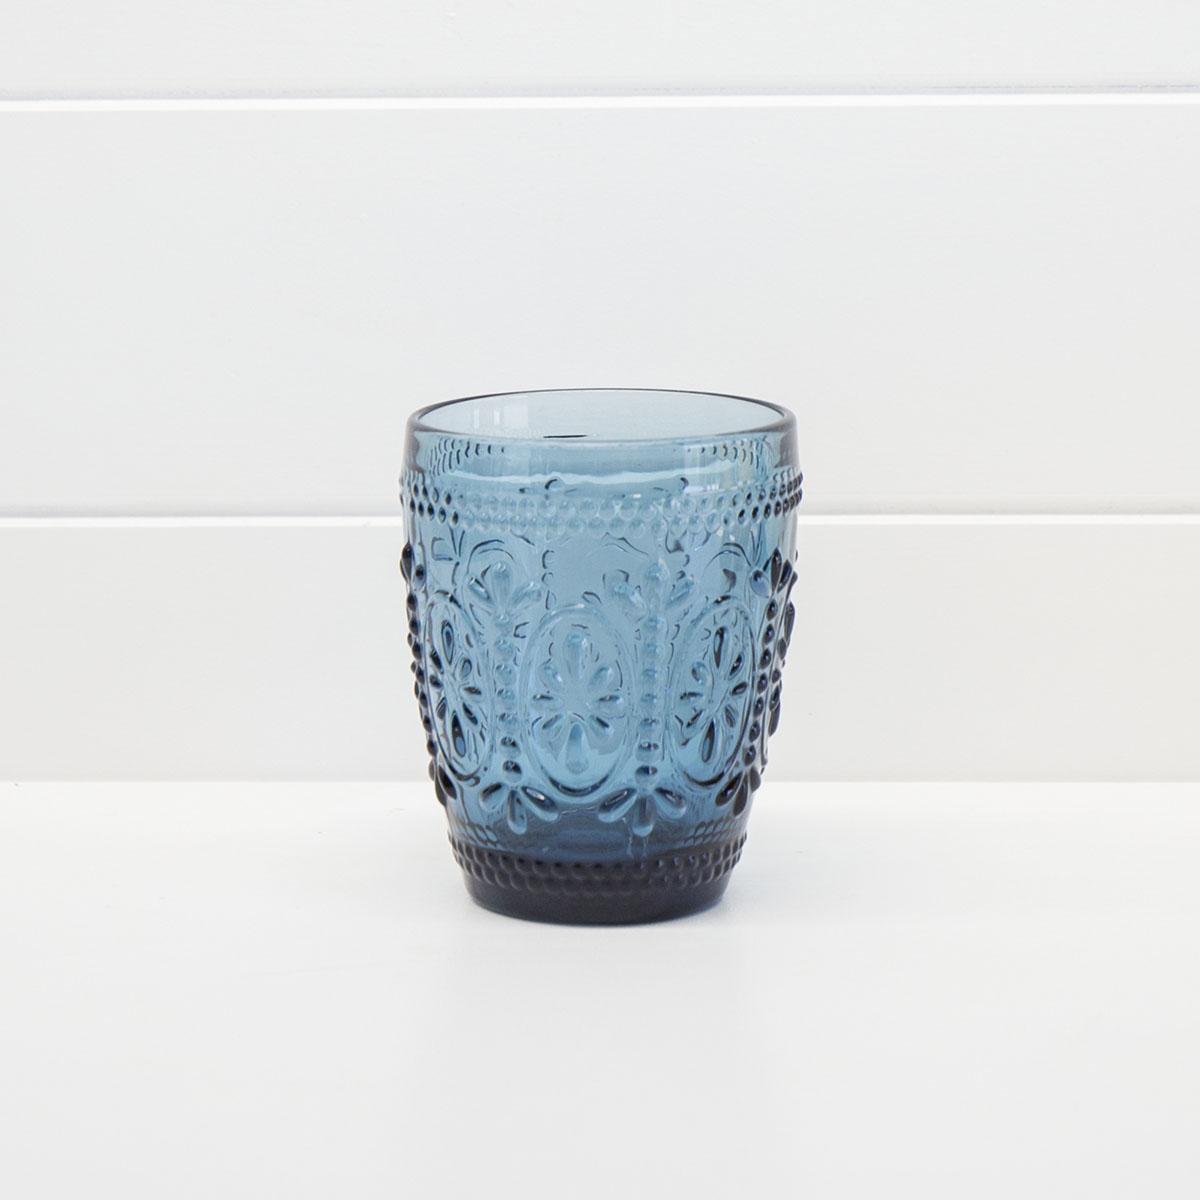 DECORATIVE BLUE WATER GLASS